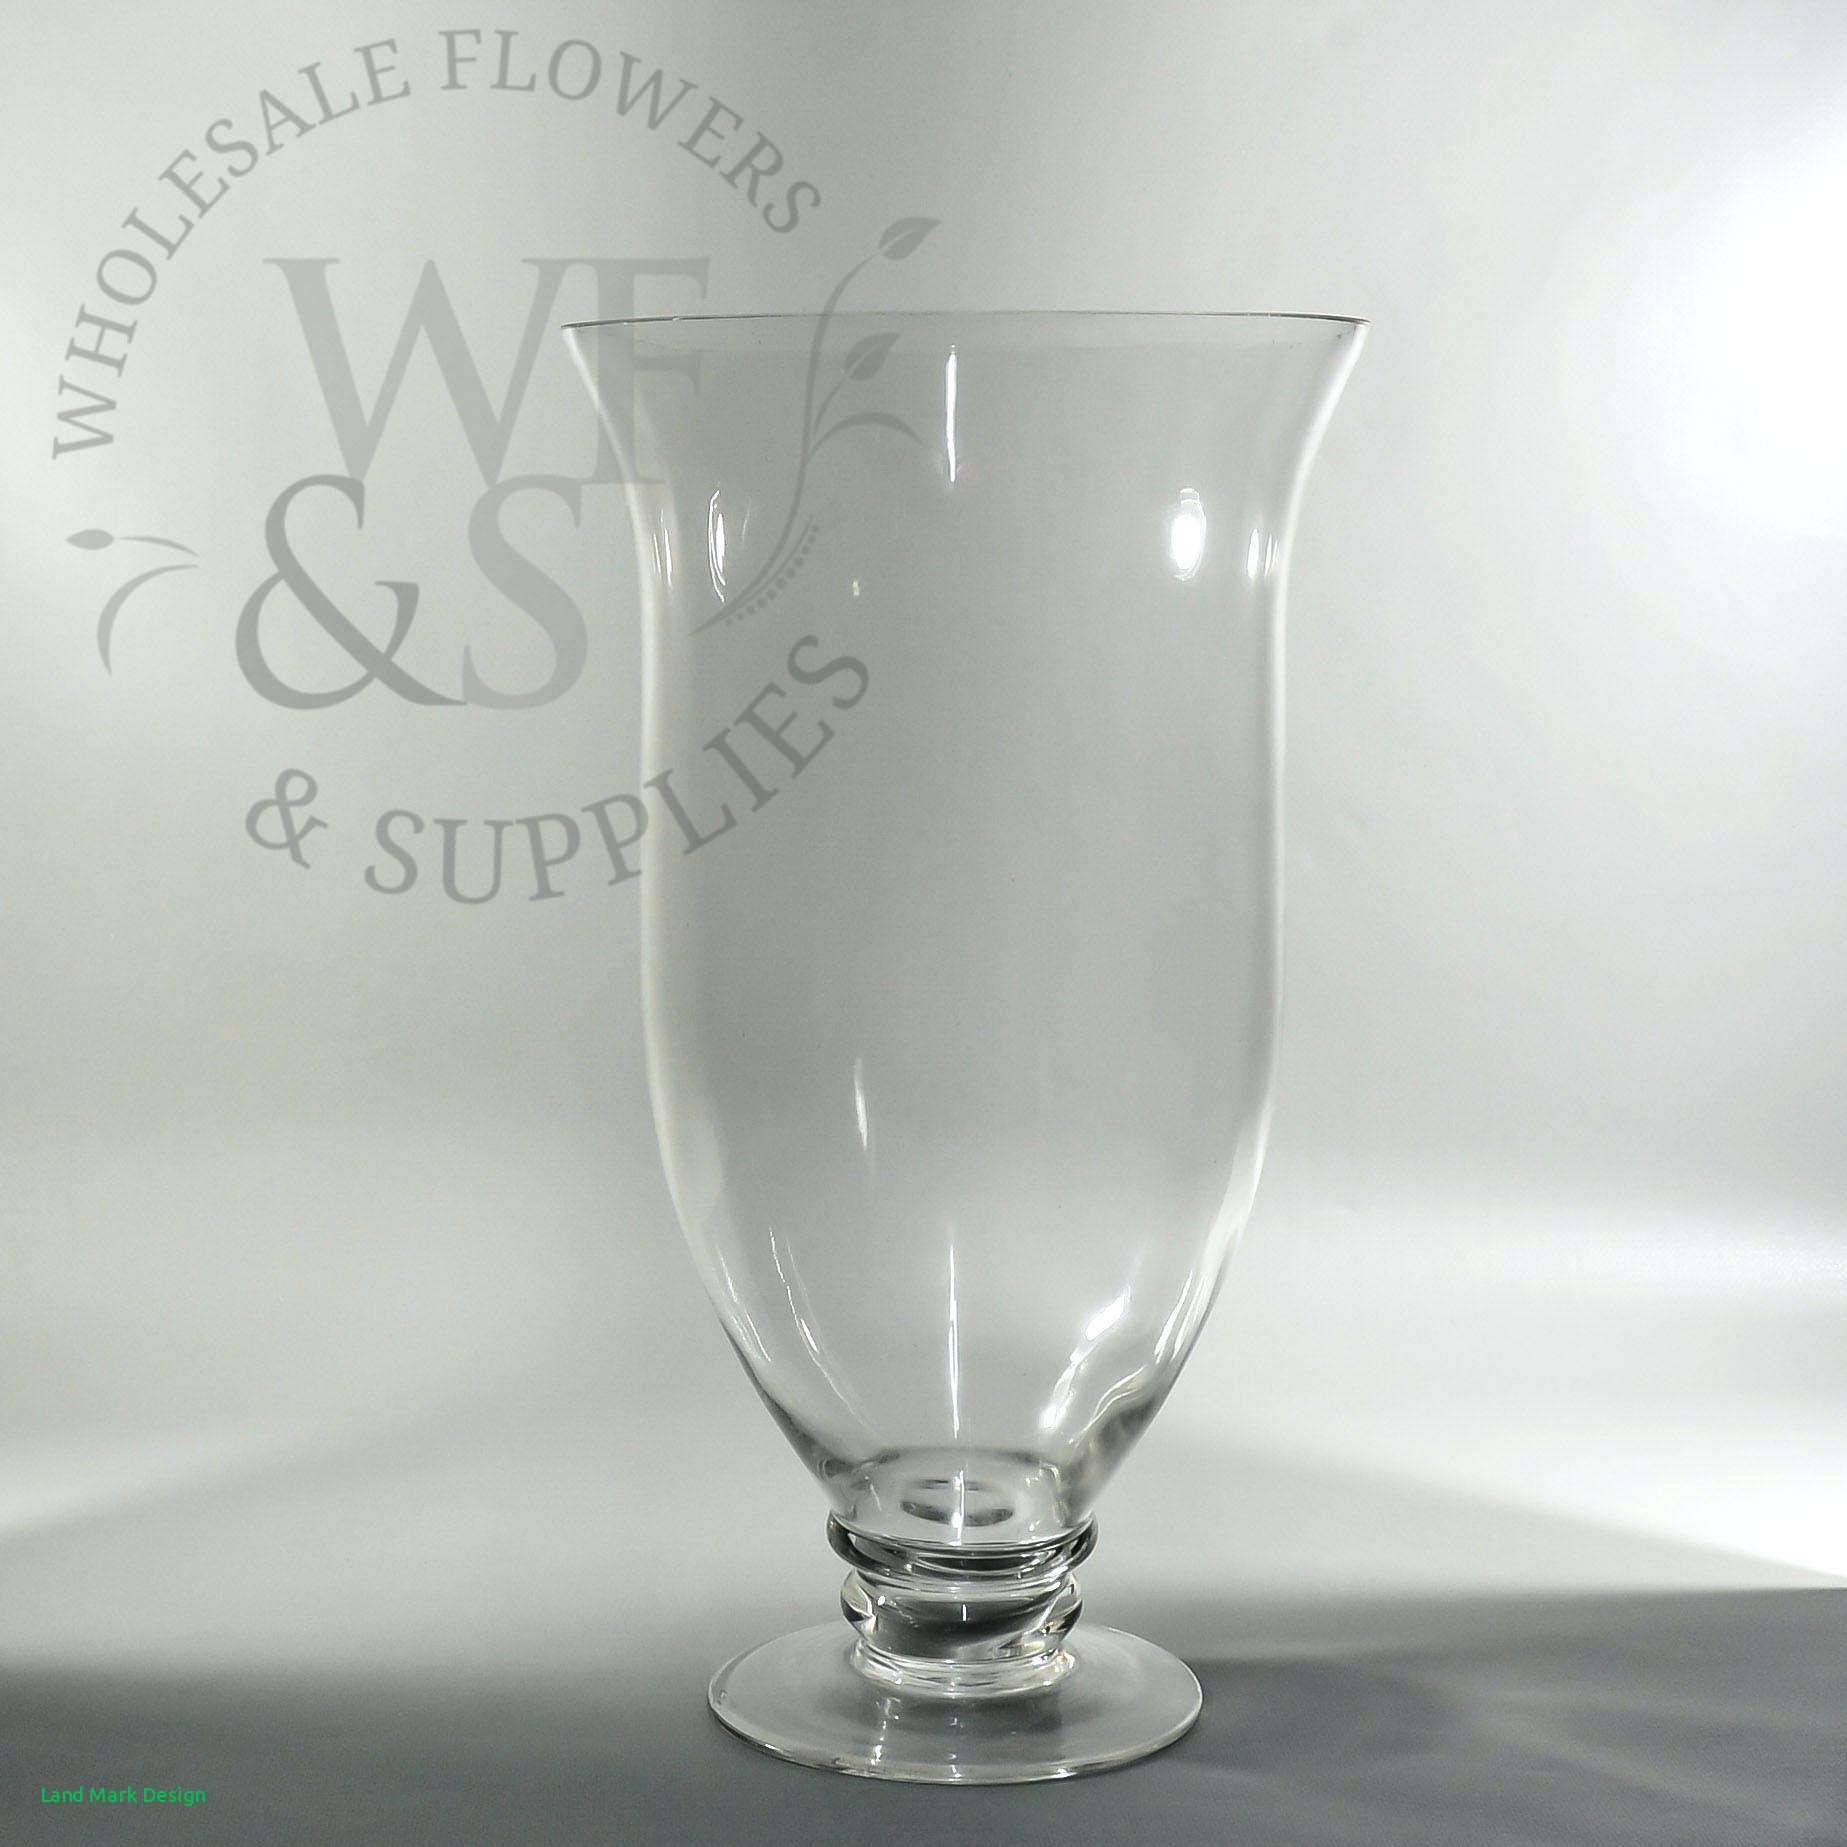 large glass flower vase of large glass vase photos vases flower floor vase with flowersi 0d with large glass vase gallery glass vase ideas design of large glass vase photos vases flower floo